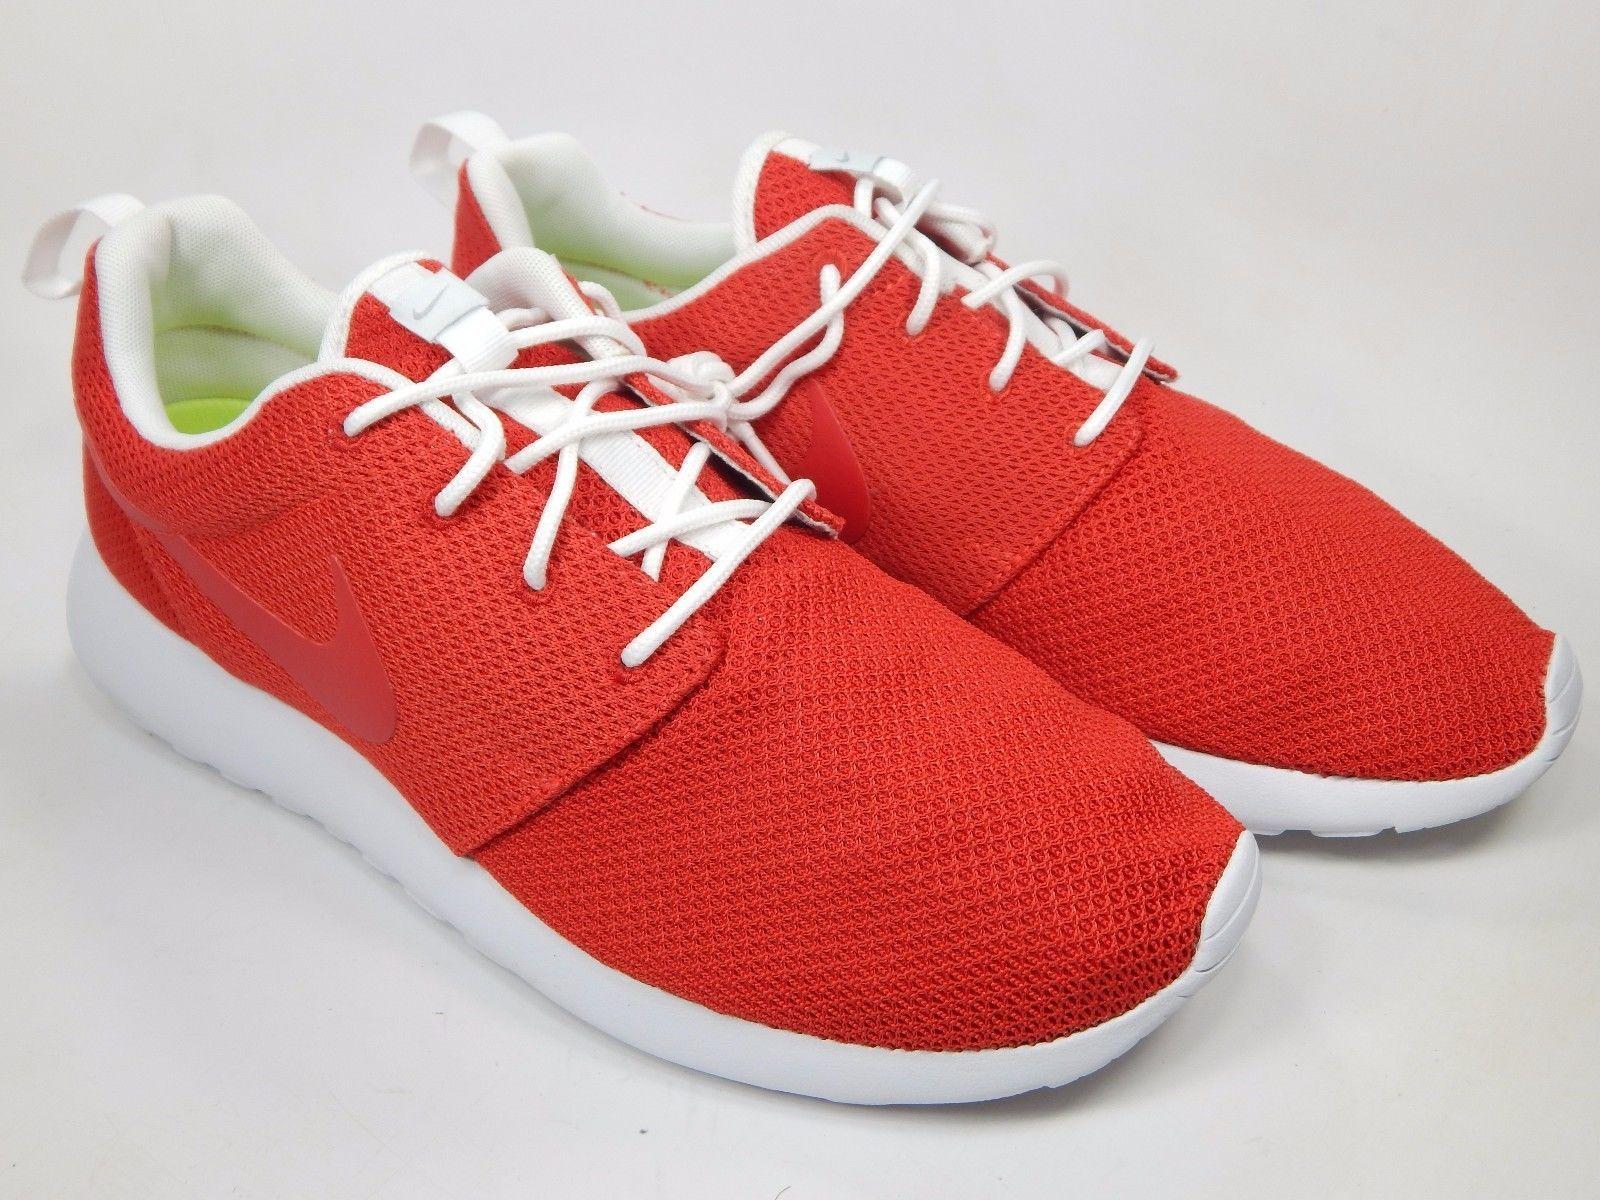 Nike Rosherun iD Bright Red Men's Running Shoes Size 11 M (D) EU 45 616834-993